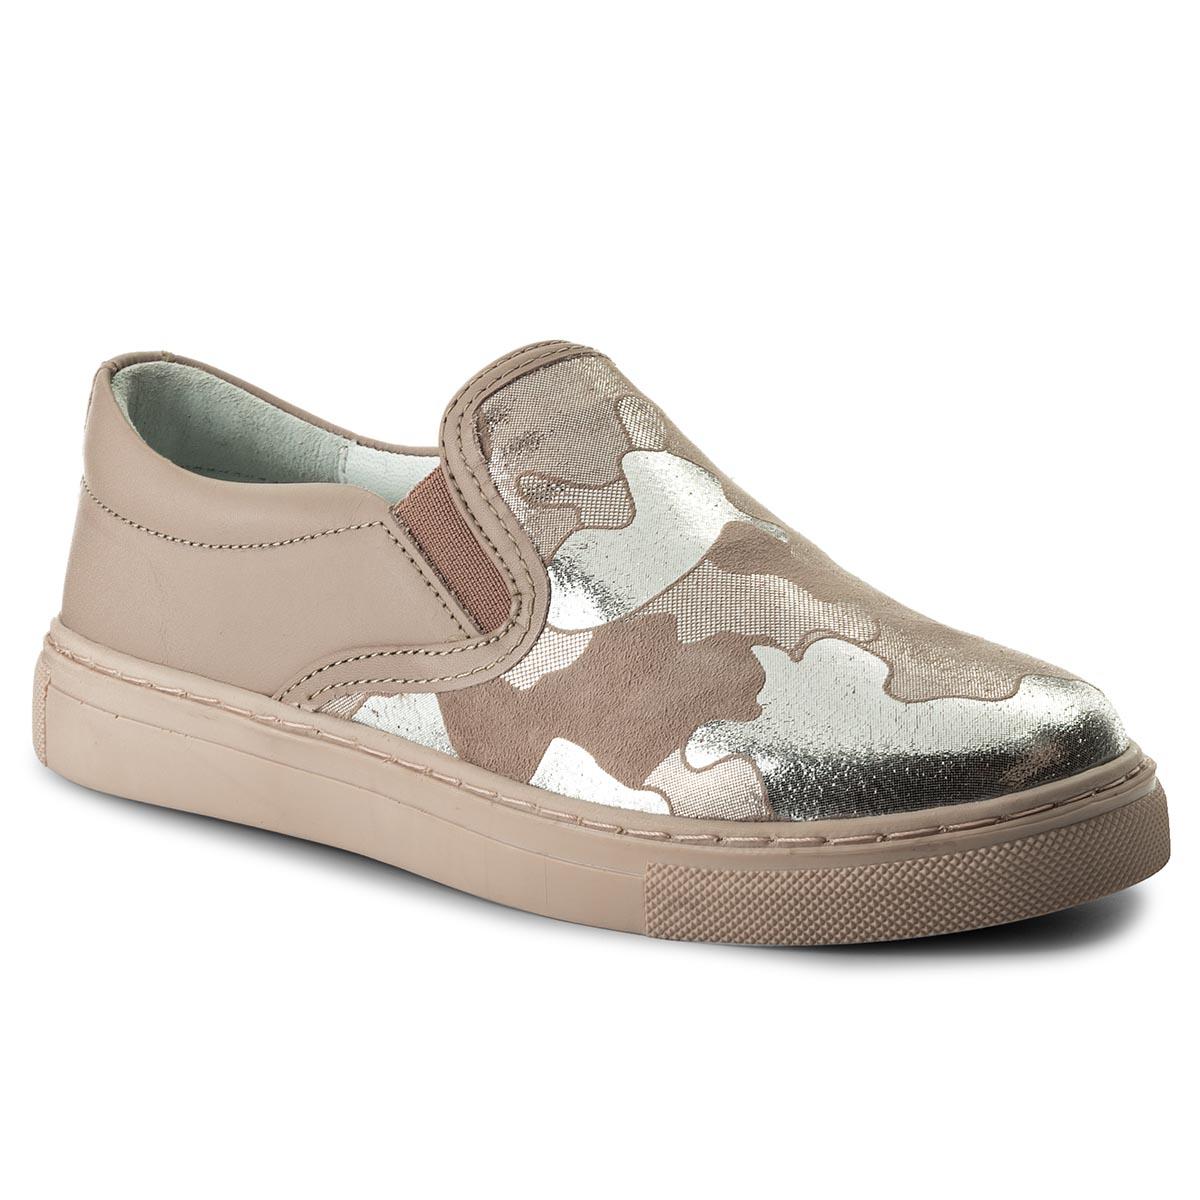 1e46dcfbf4 Plimsolls LASOCKI YOUNG - CI12-2899-02 White - Slided shoes - Low ...